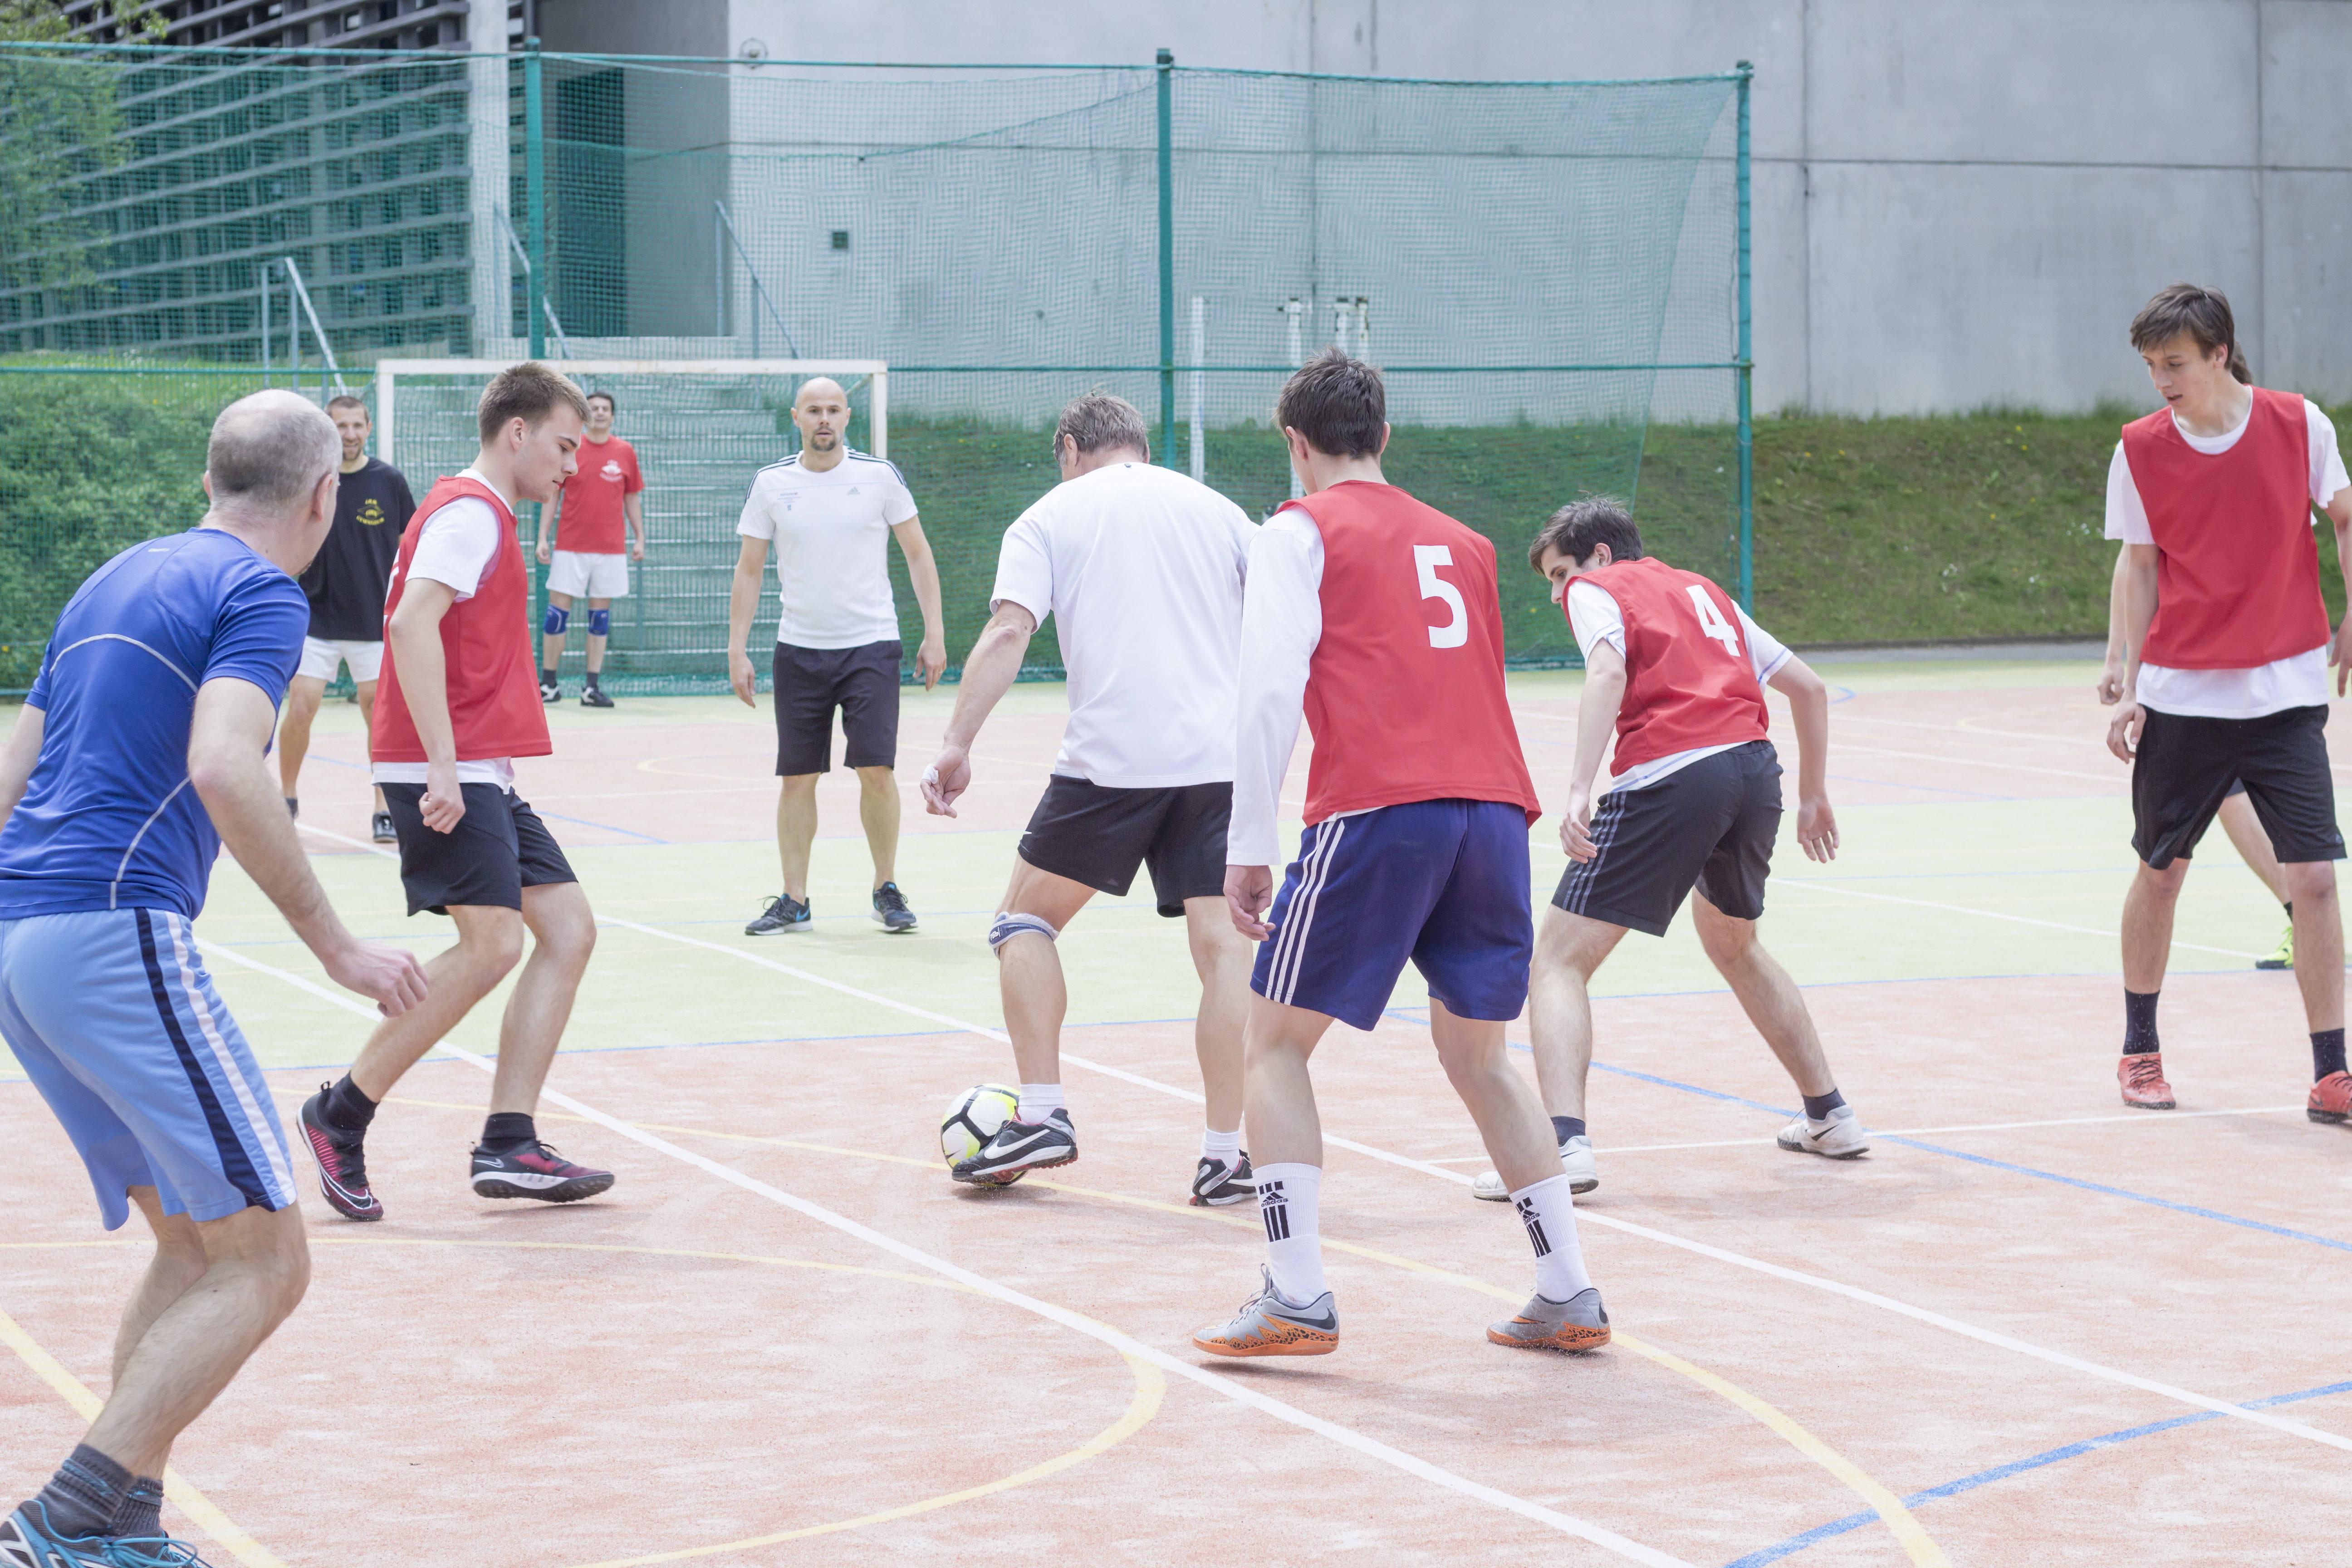 rsz_fotbal-10.jpg